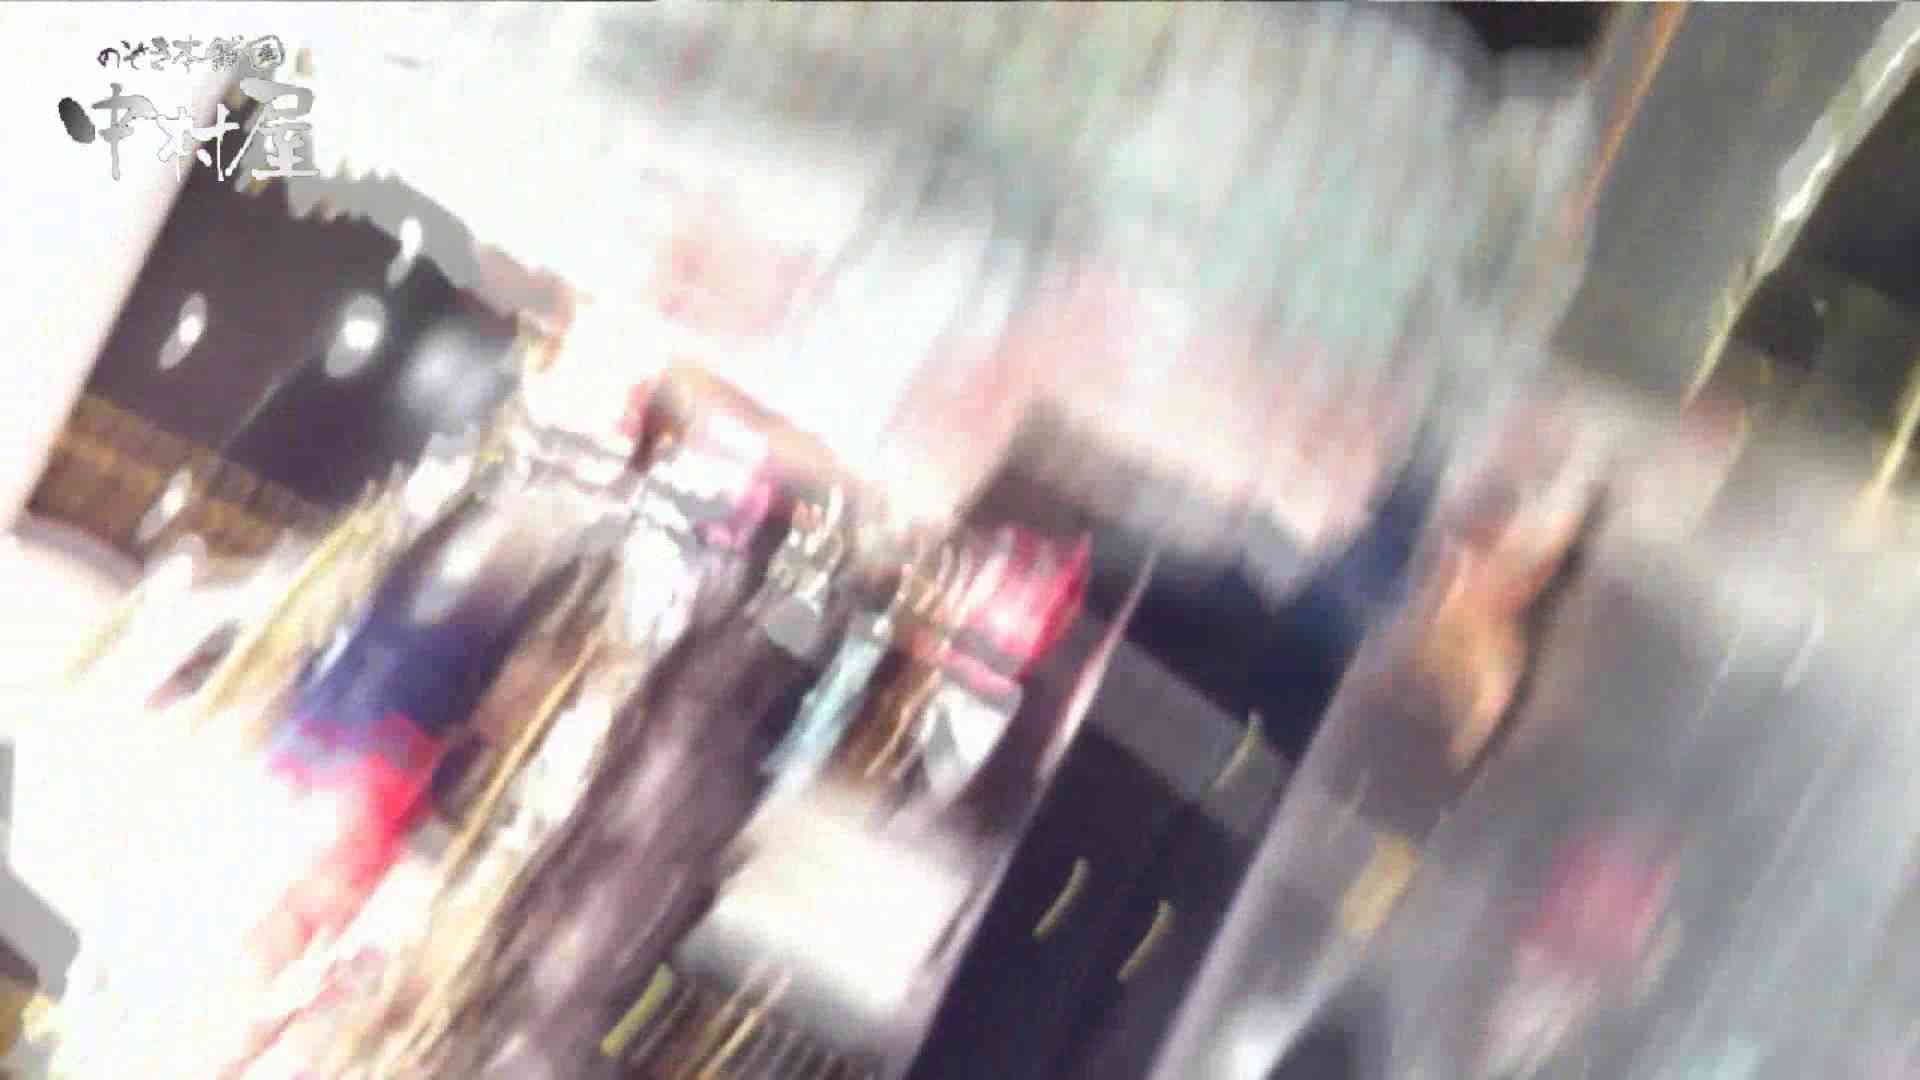 vol.47 カリスマ店員胸チラ&パンチラ 黒パン店員さん いやらしいOL 盗撮動画紹介 39連発 2